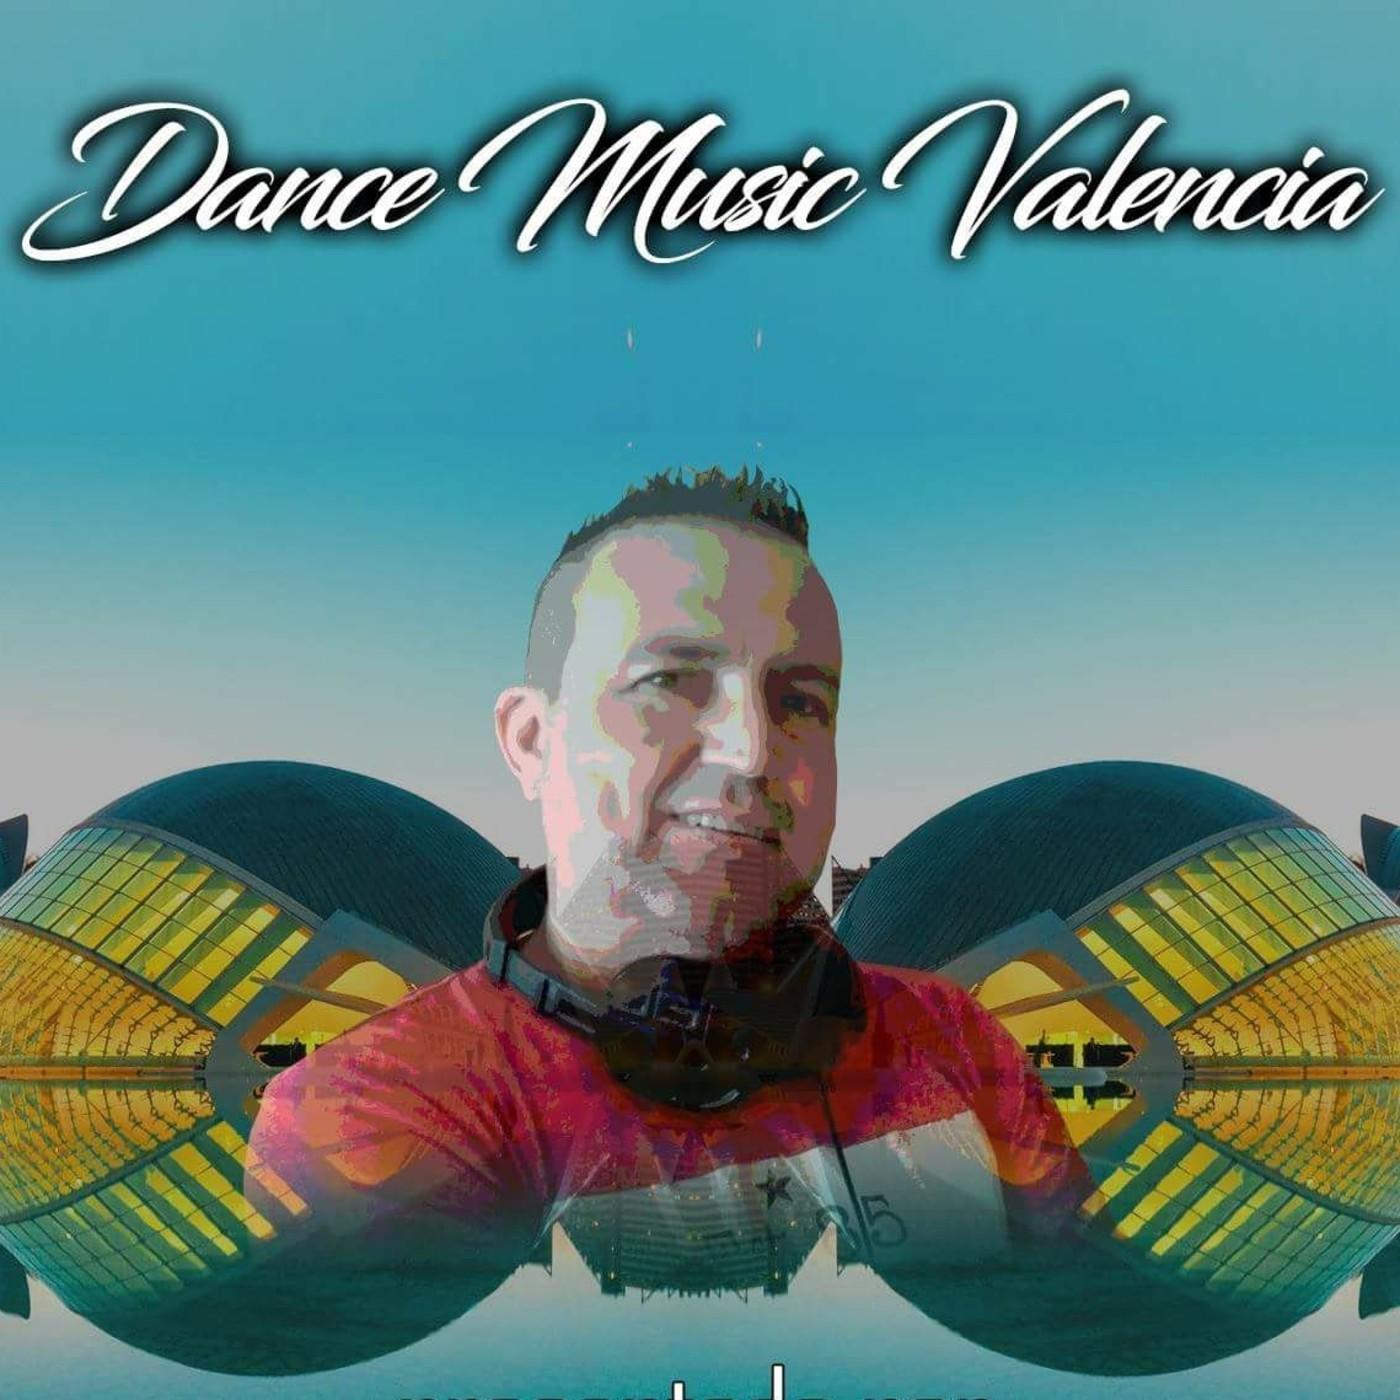 Dance Music Valencia Temp 2 Episodio 1 Con Dj Panadero En Jorge